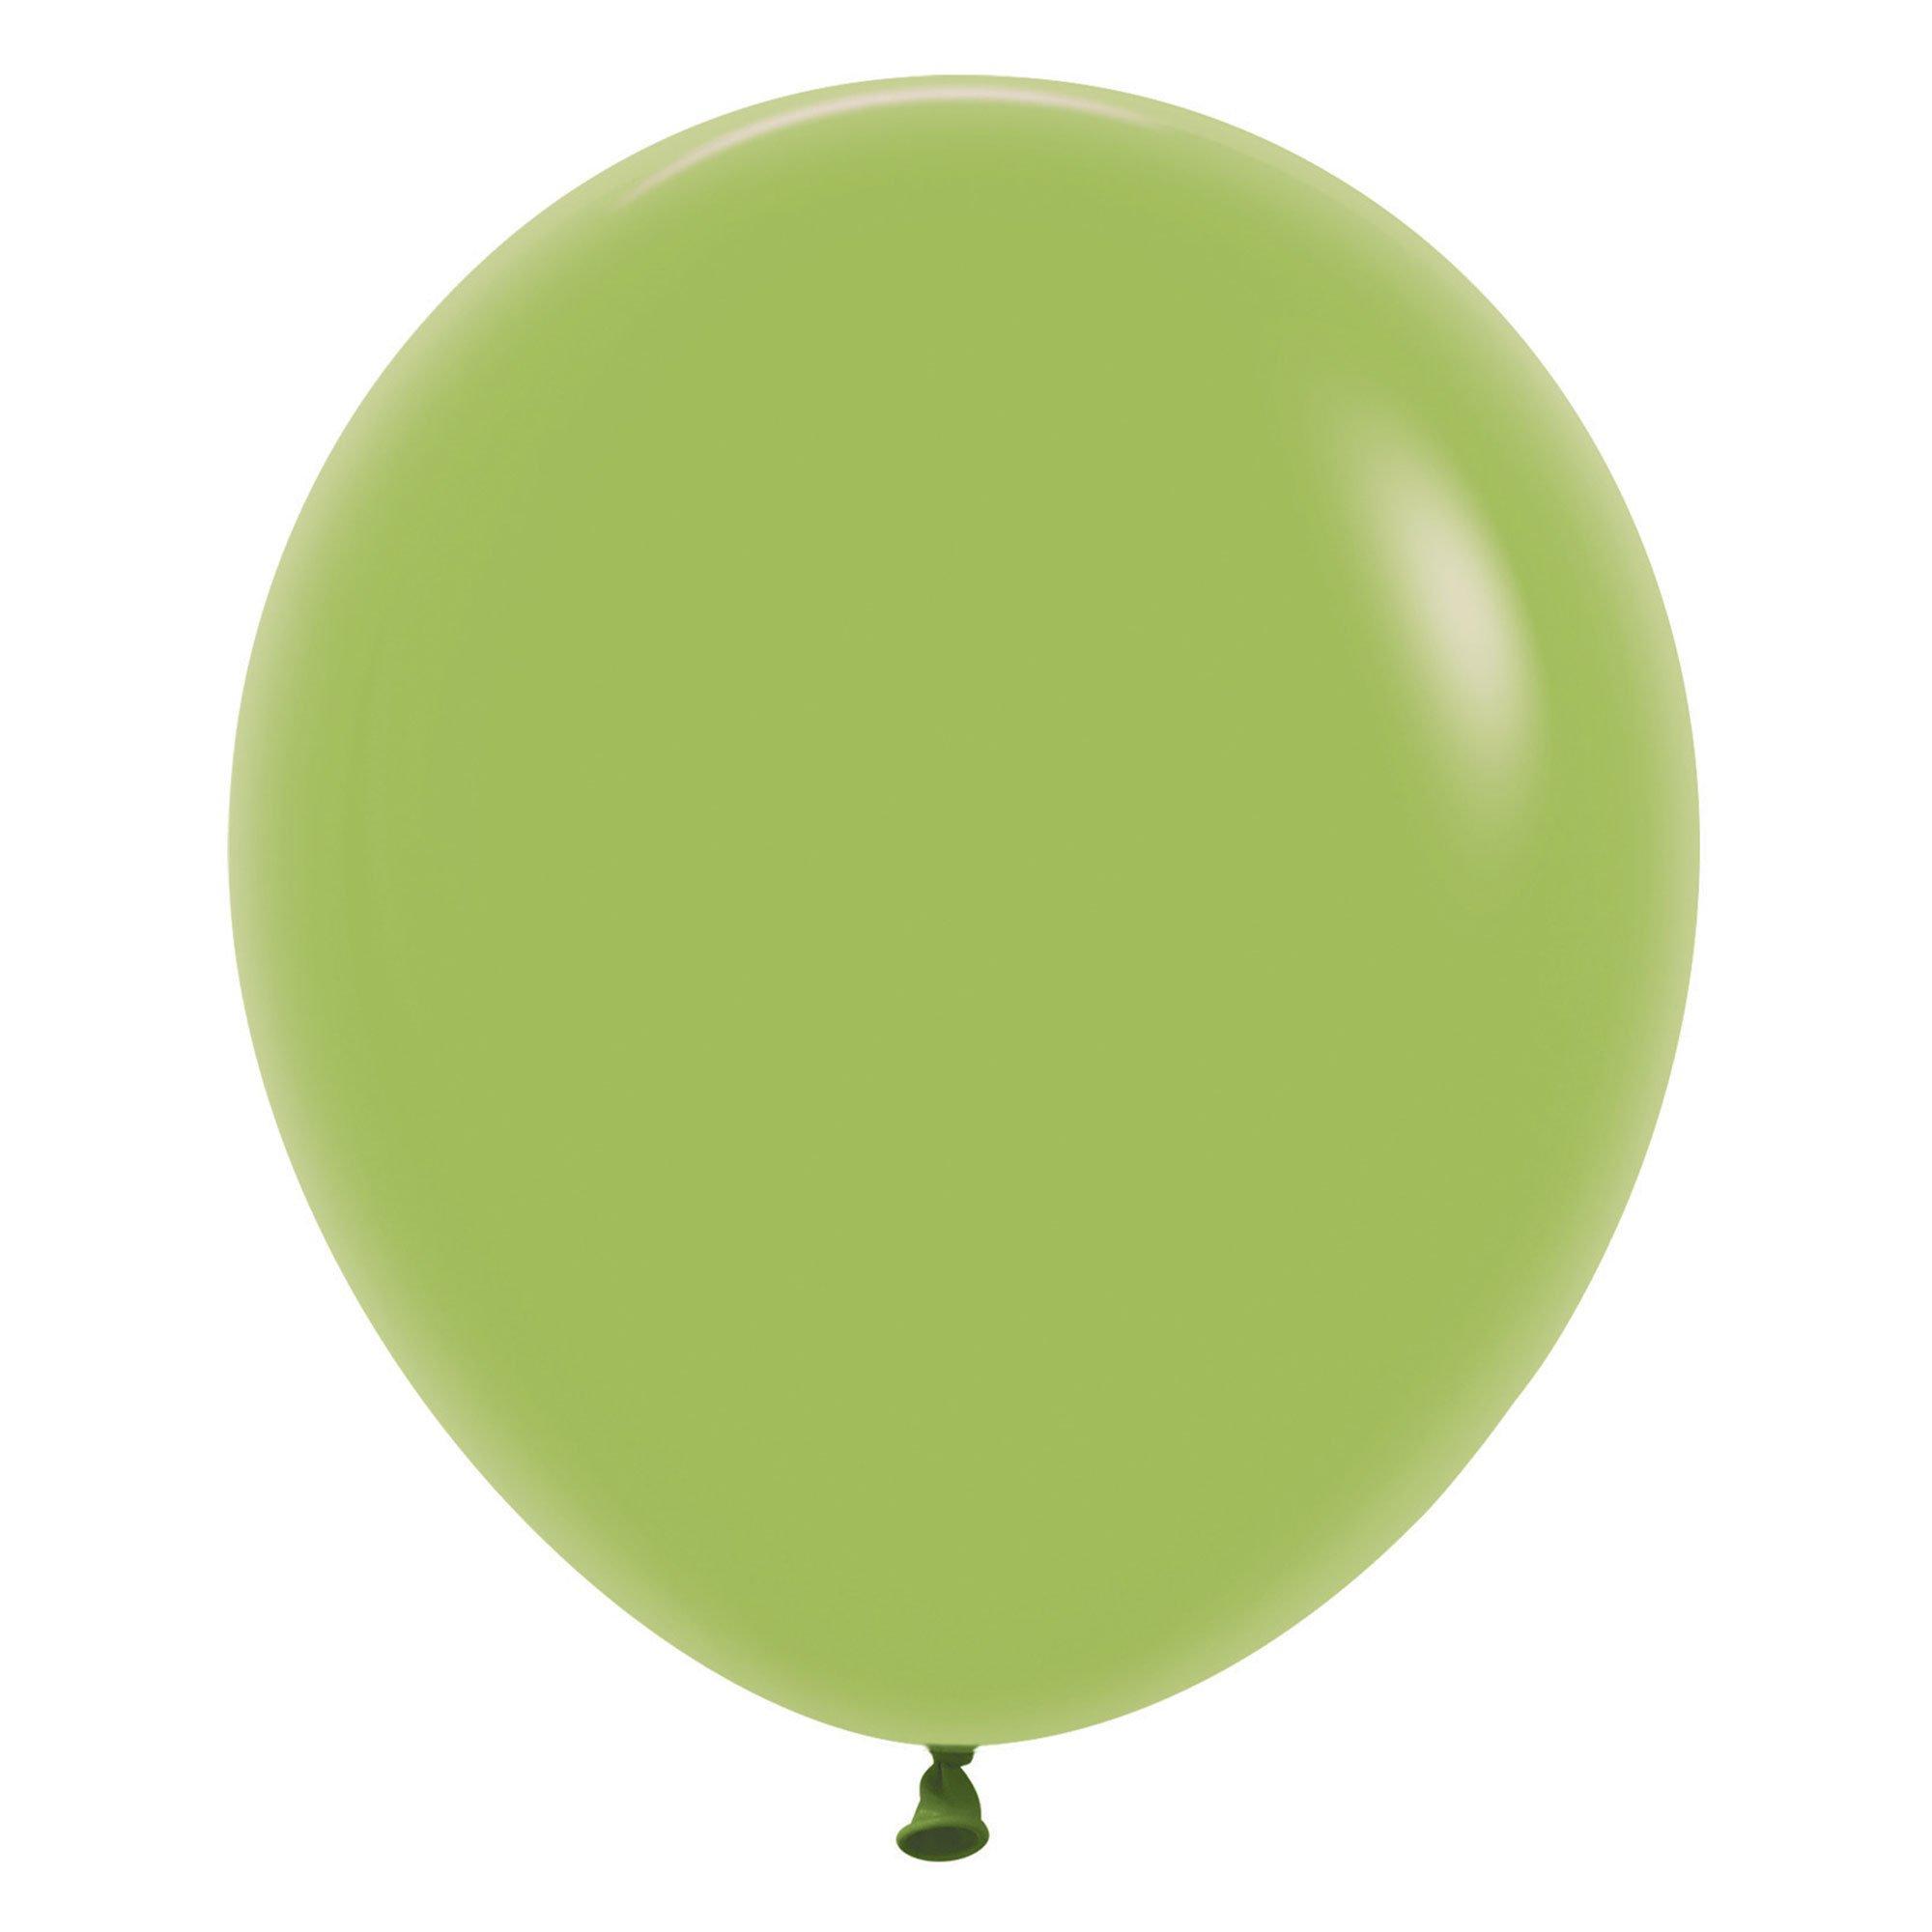 Sempertex 45cm Fashion Lime Green Latex Balloons 031, 6PK